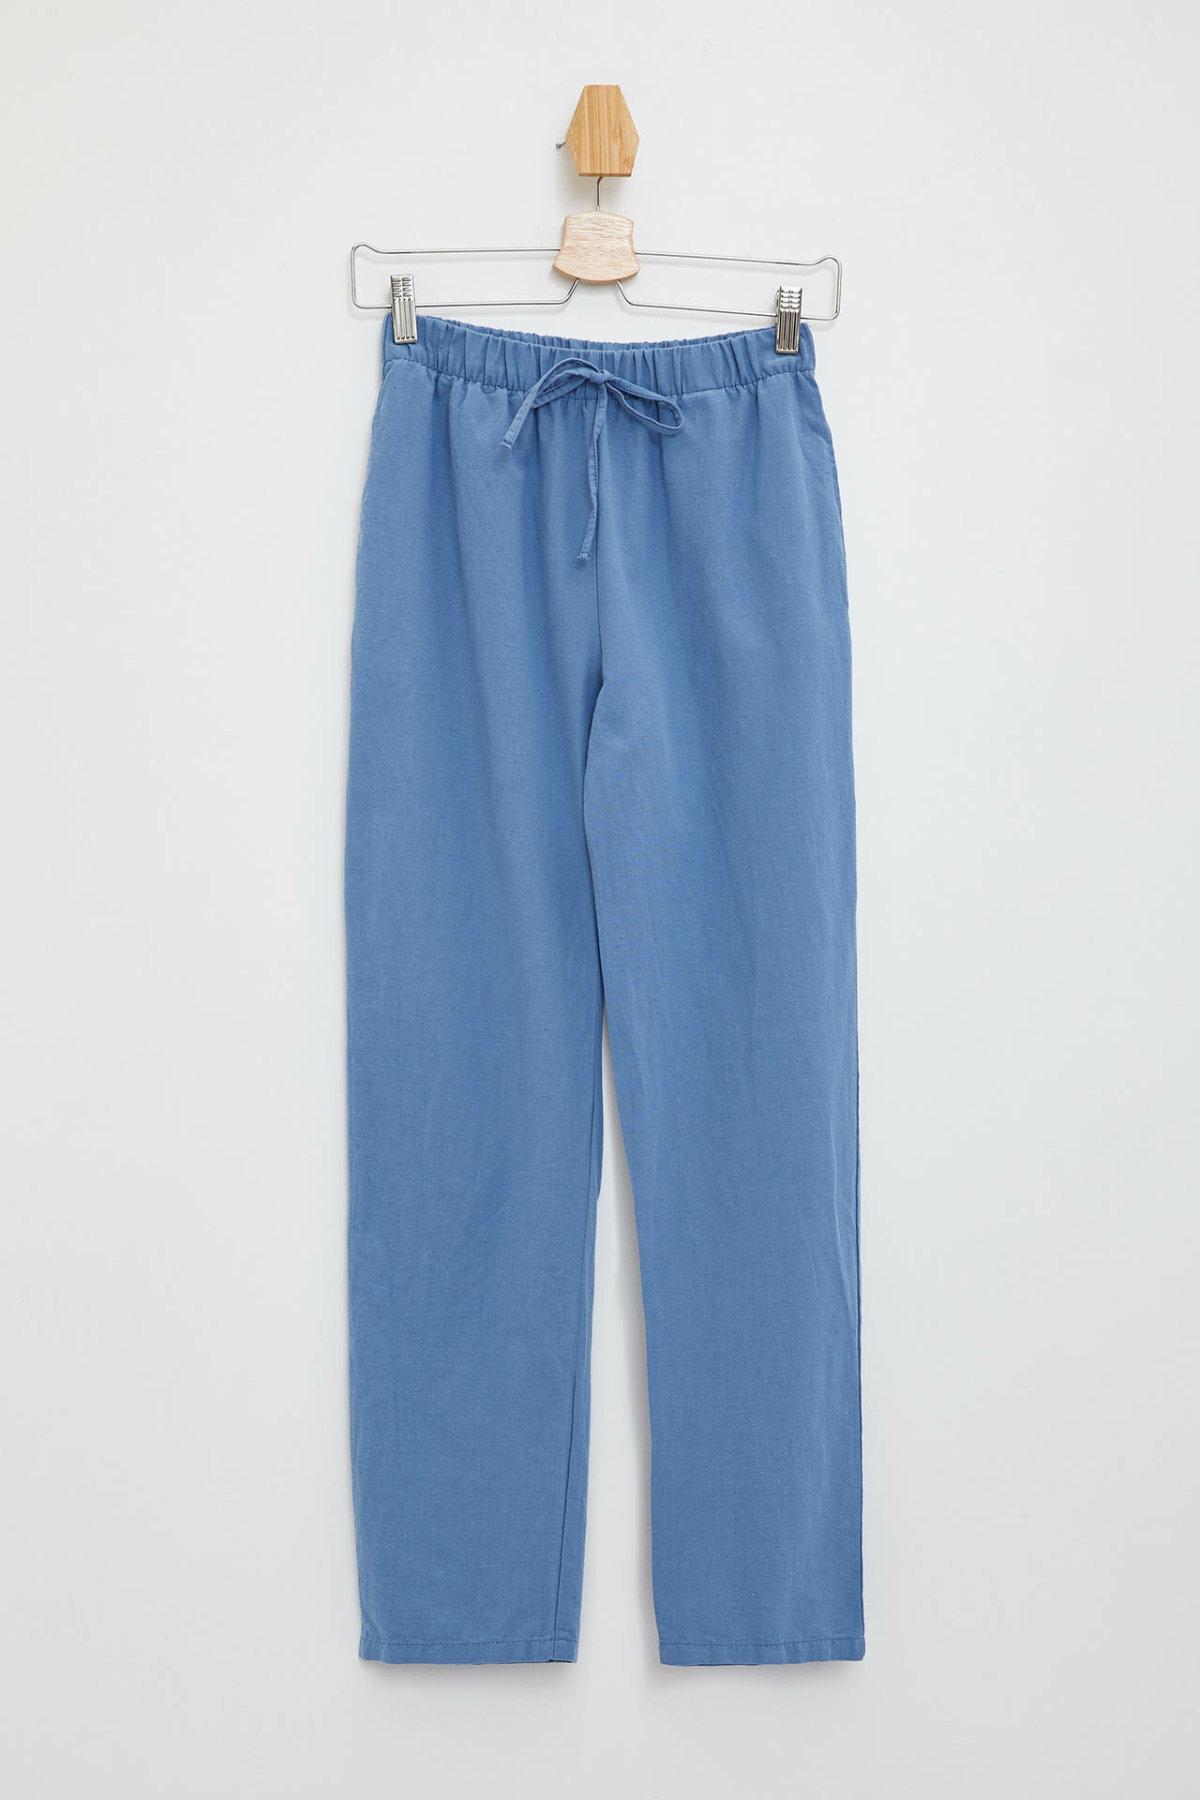 DeFacto Casual Woman Fashion Trousers Female Casual Drawstring Loose Pants Comfort Pure Color Crop Pant New - L7329AZ19HS